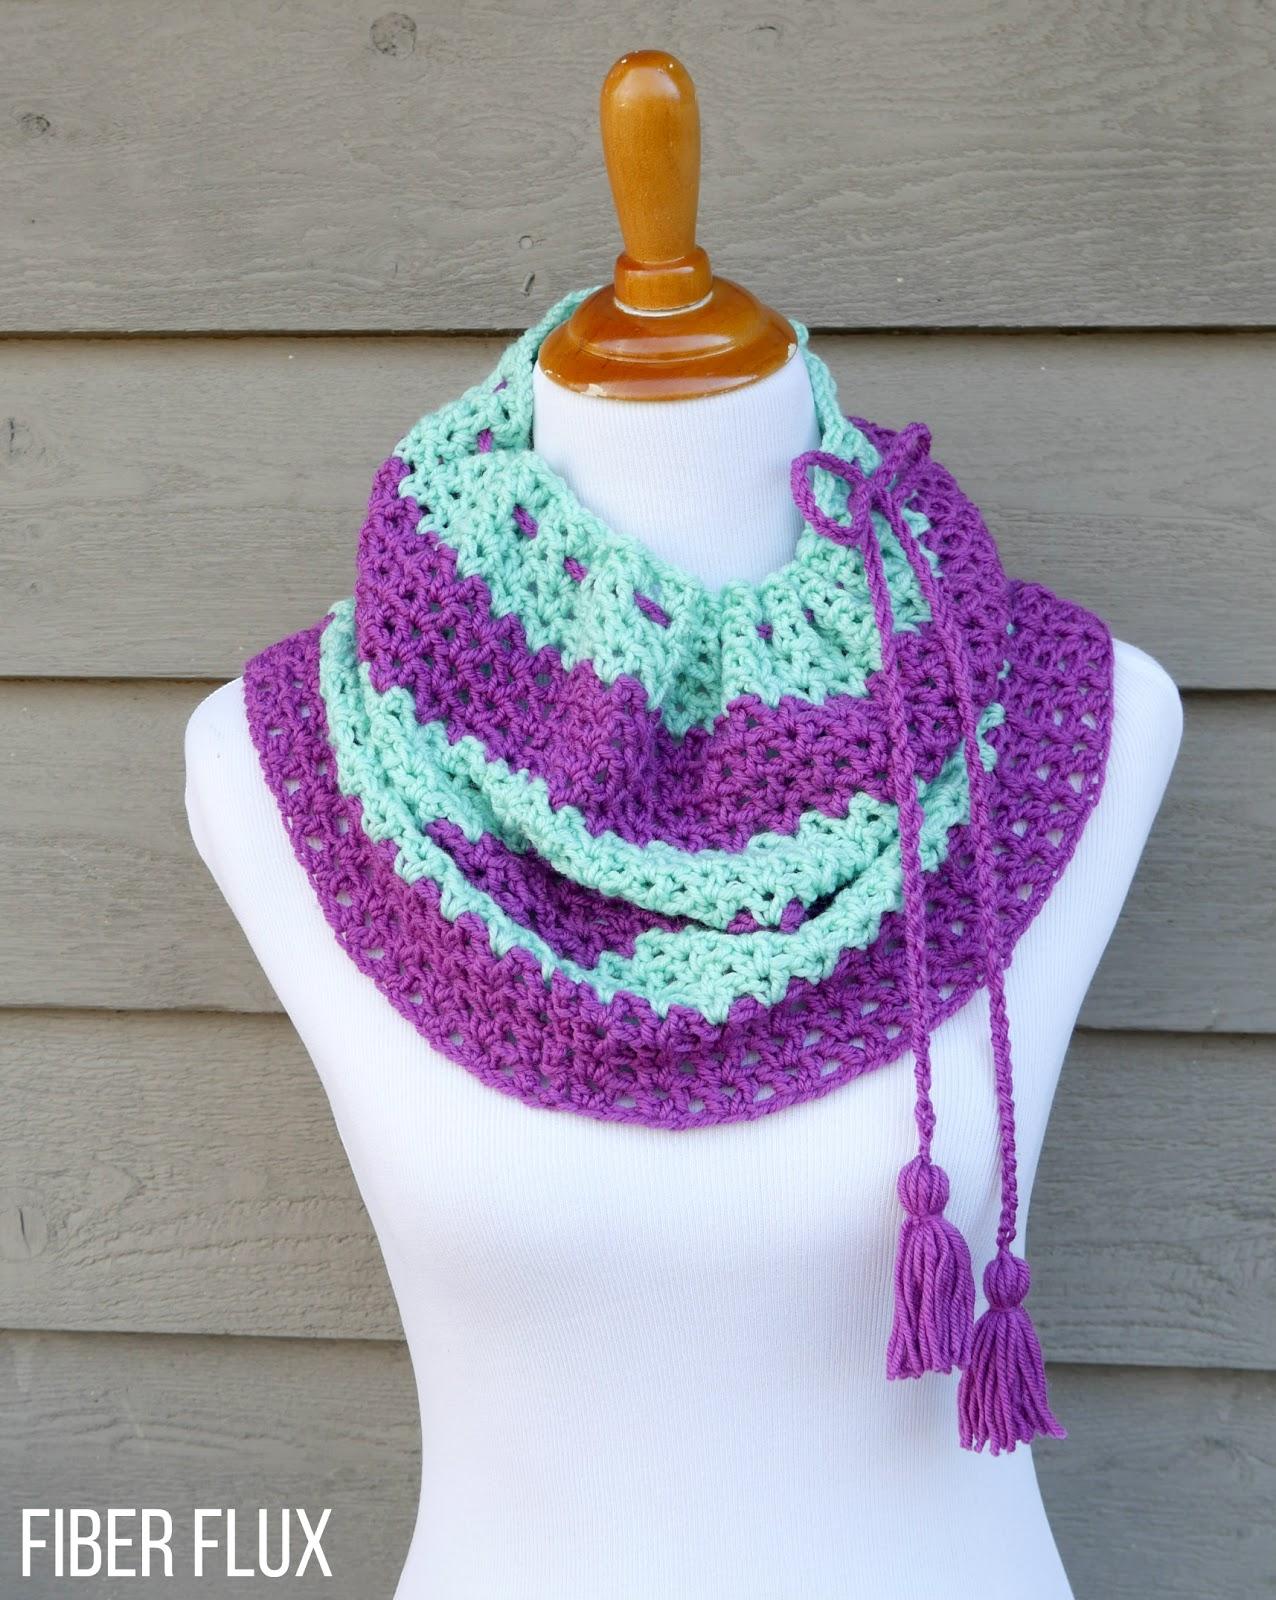 Fiber Flux Free Crochet Patternraspberry Mint Tassel Cowl